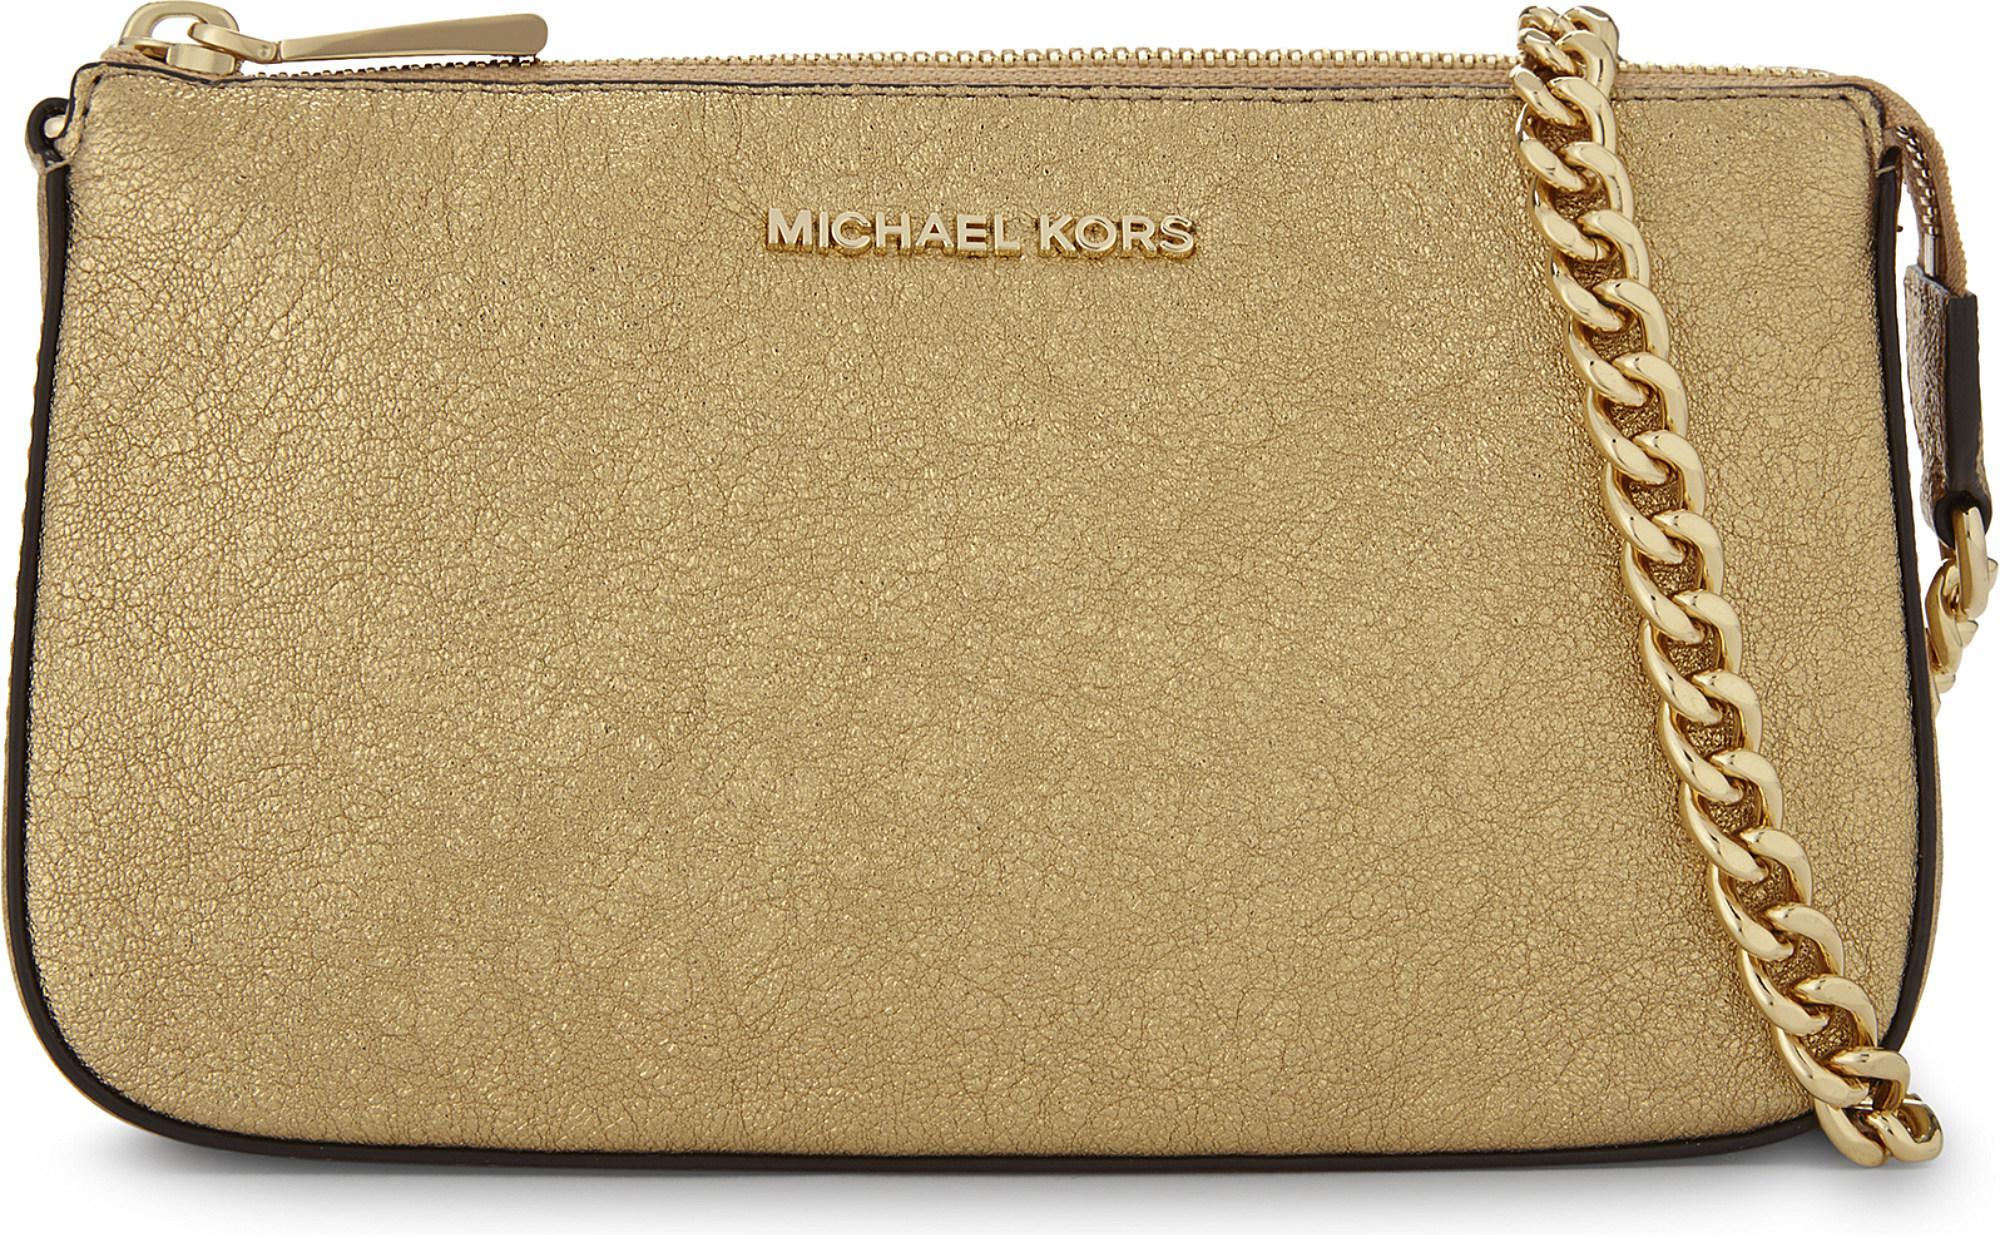 3ad19b2b4206 MICHAEL Michael Kors Mini Amor Glitter Shoulder Bag in Metallic - Lyst